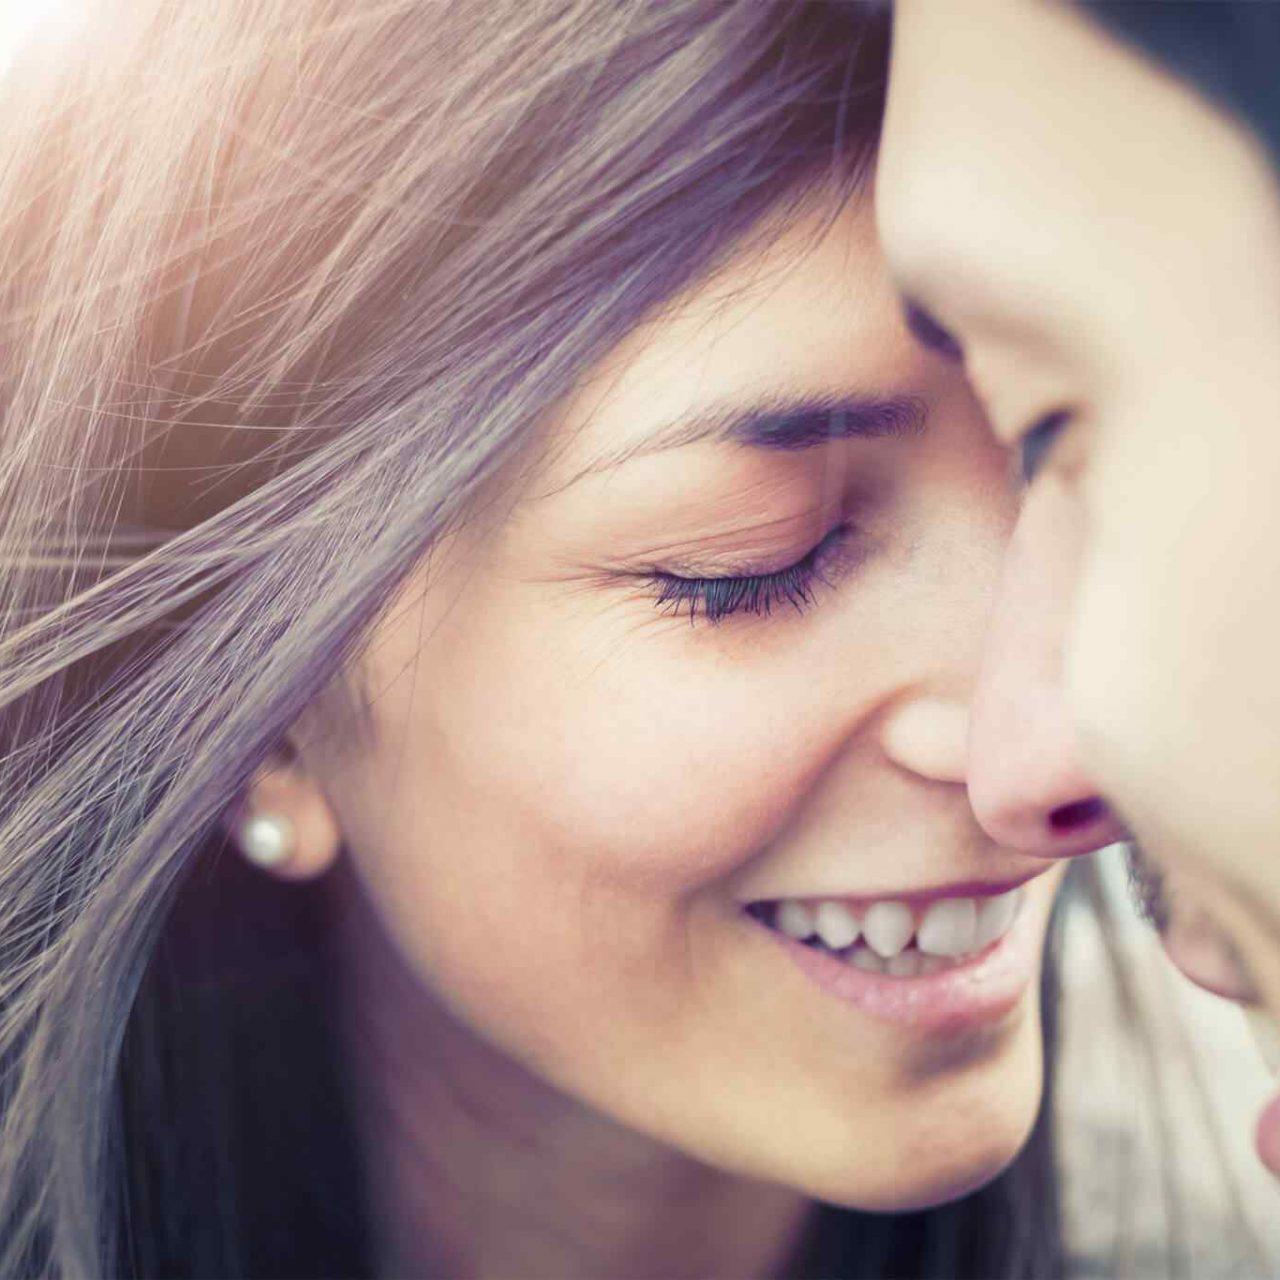 http://www.solucoaching.com/wp-content/uploads/2018/01/img-class-marriage-01-1280x1280.jpg